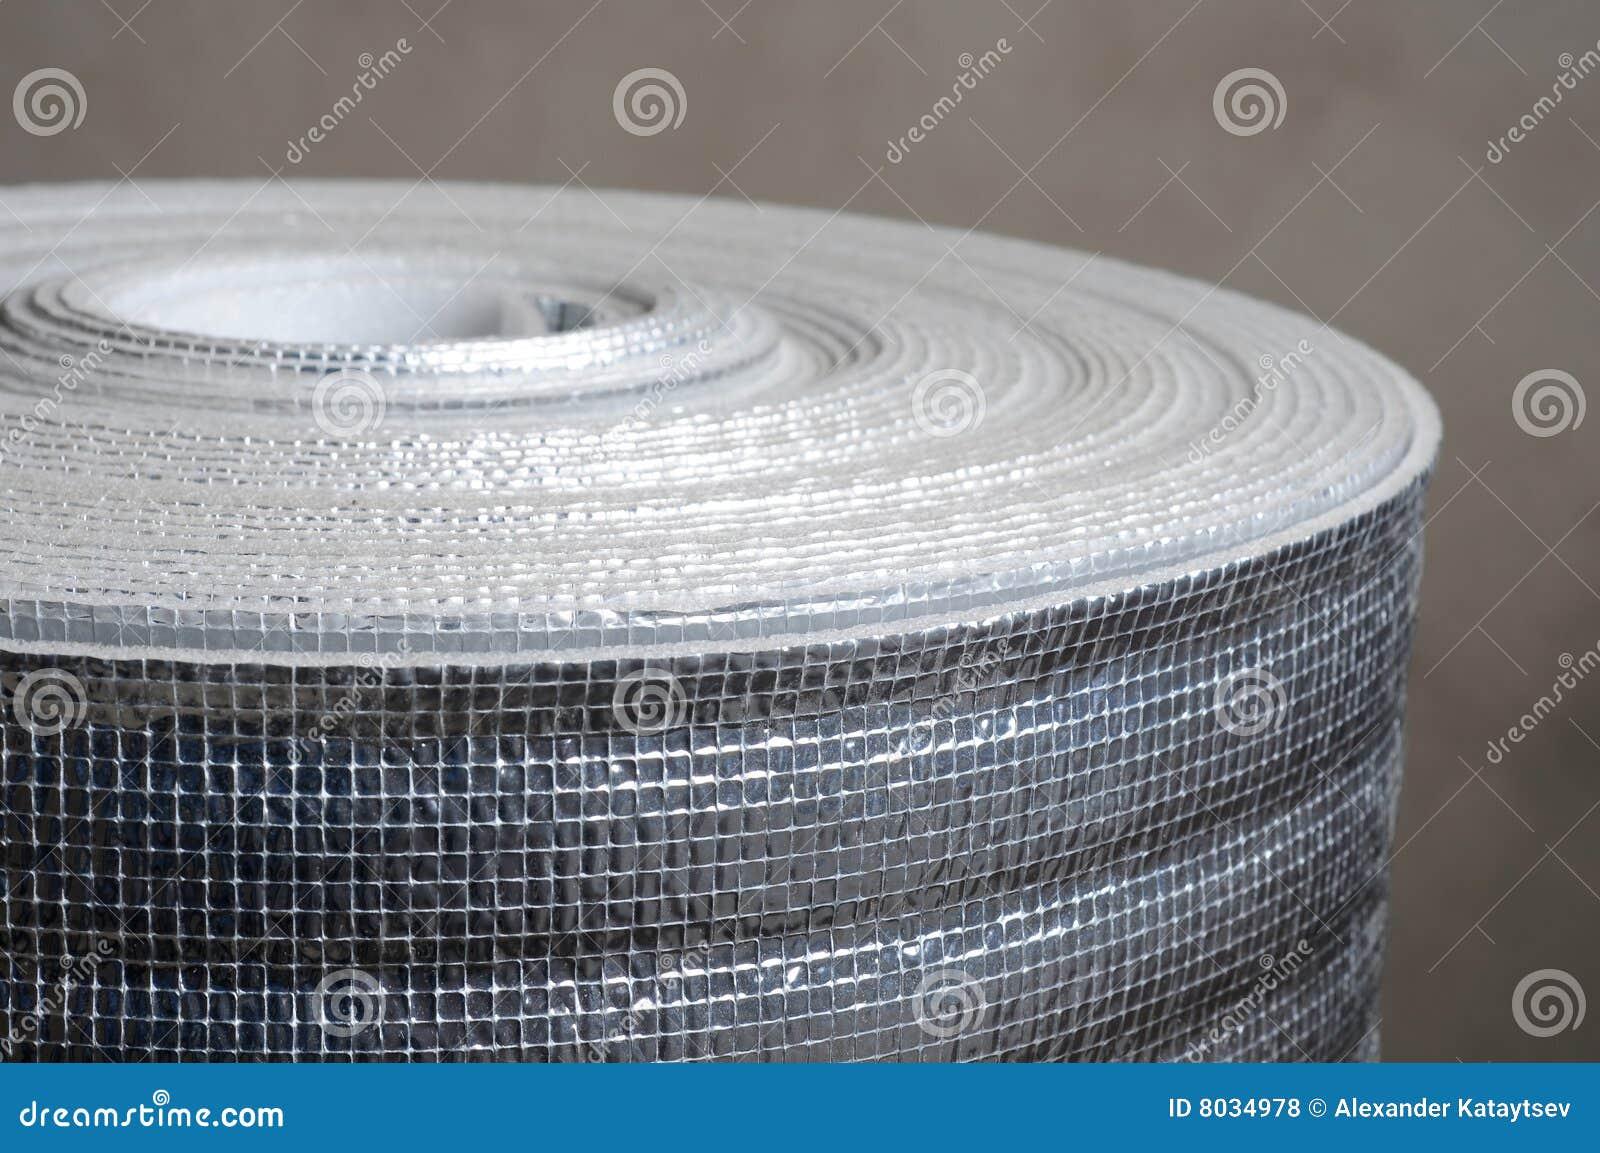 Aislante de calor fotos de archivo libres de regal as - Material aislante del calor ...